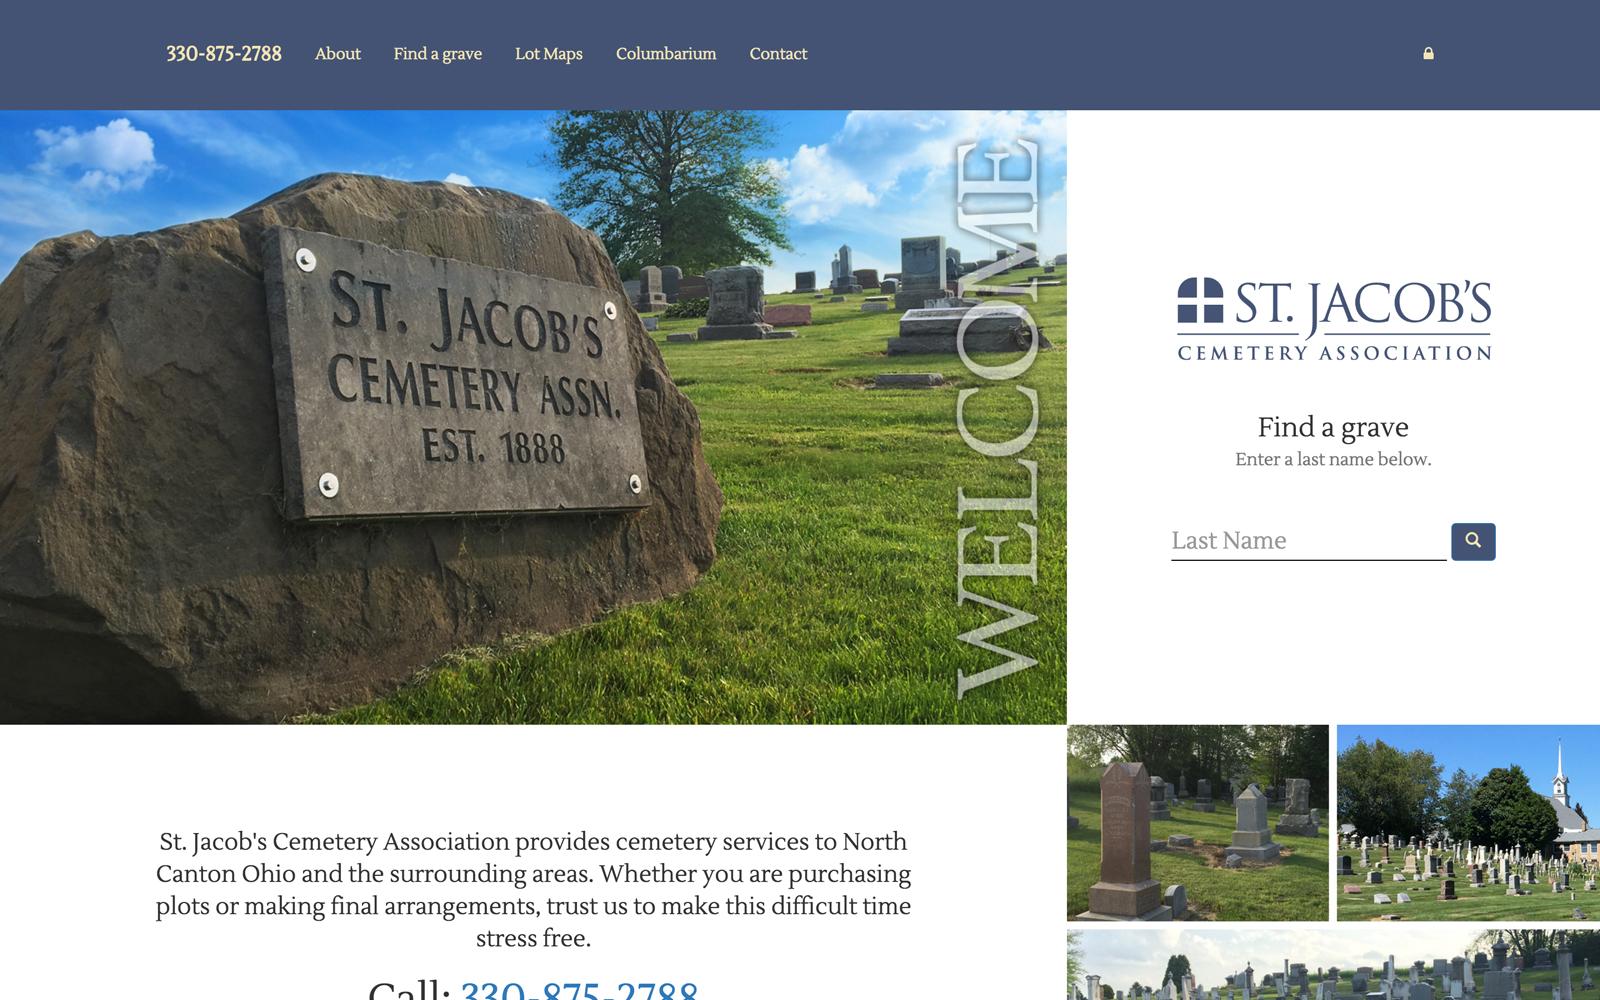 website-homepage-st-jacobs-cemetery-association.jpg